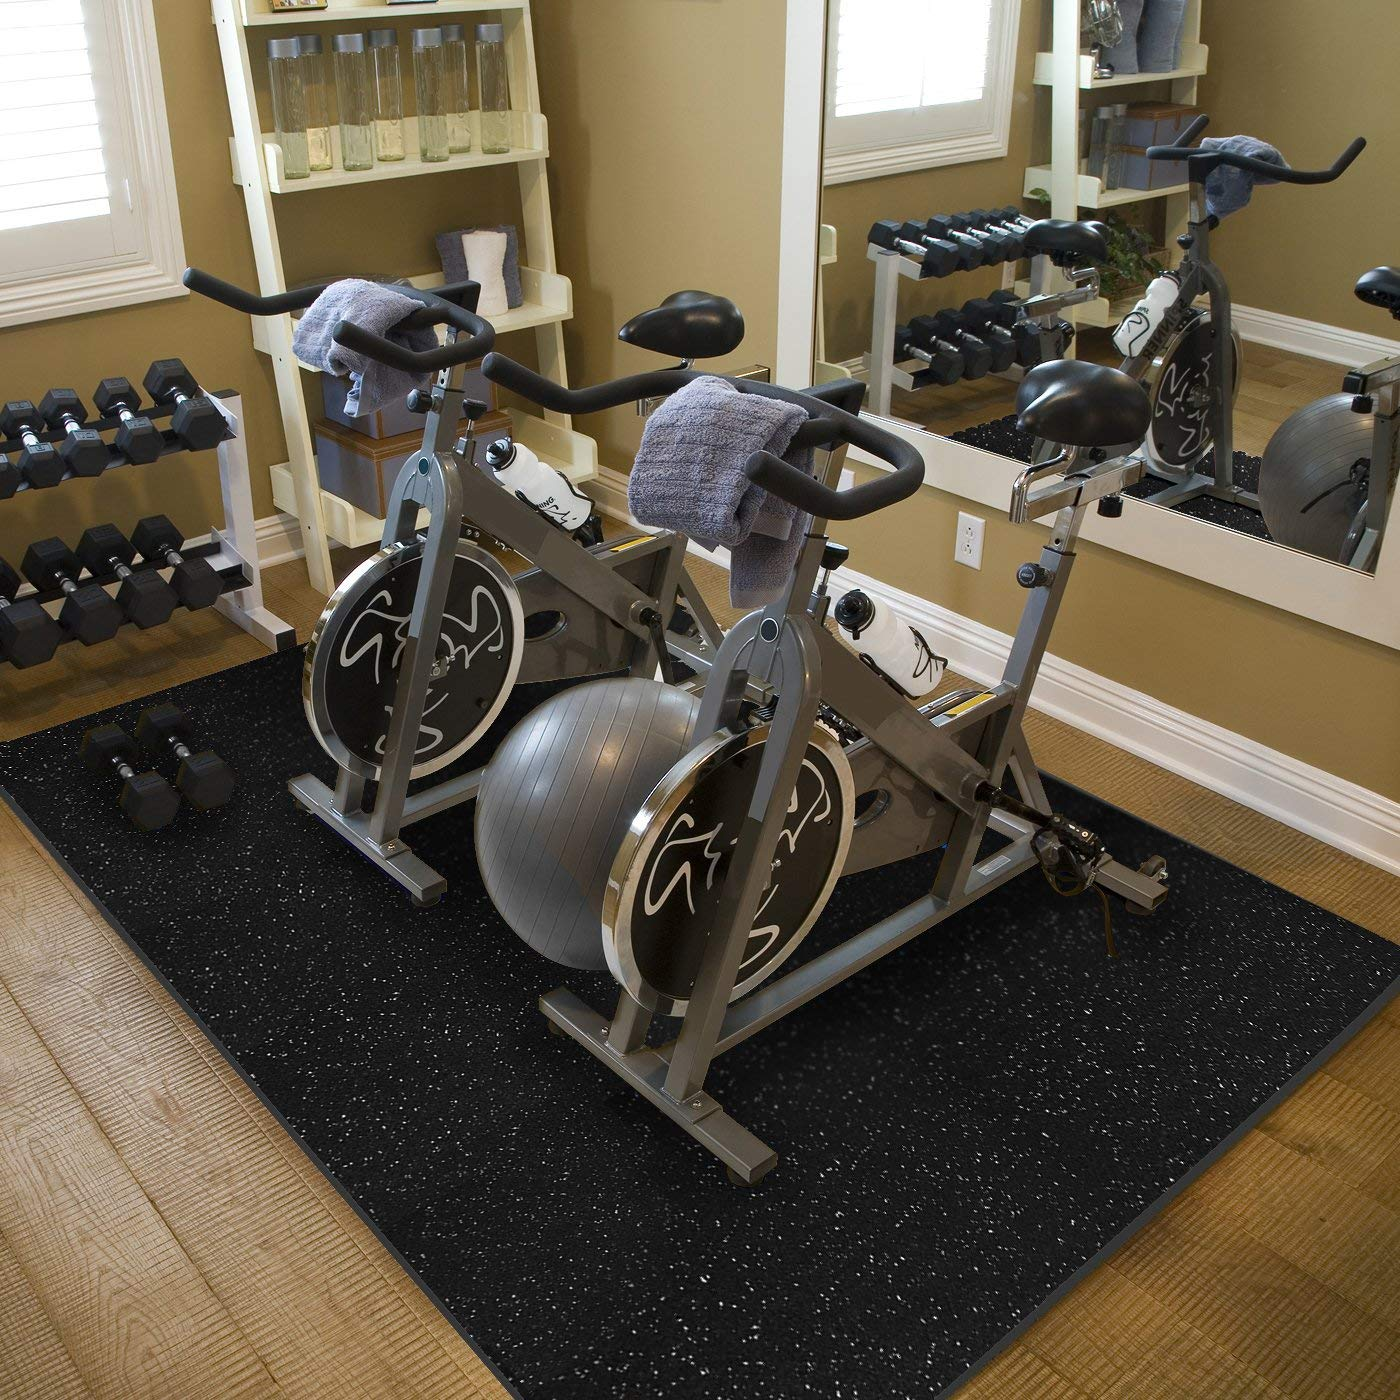 amenager son propre gym a la maison